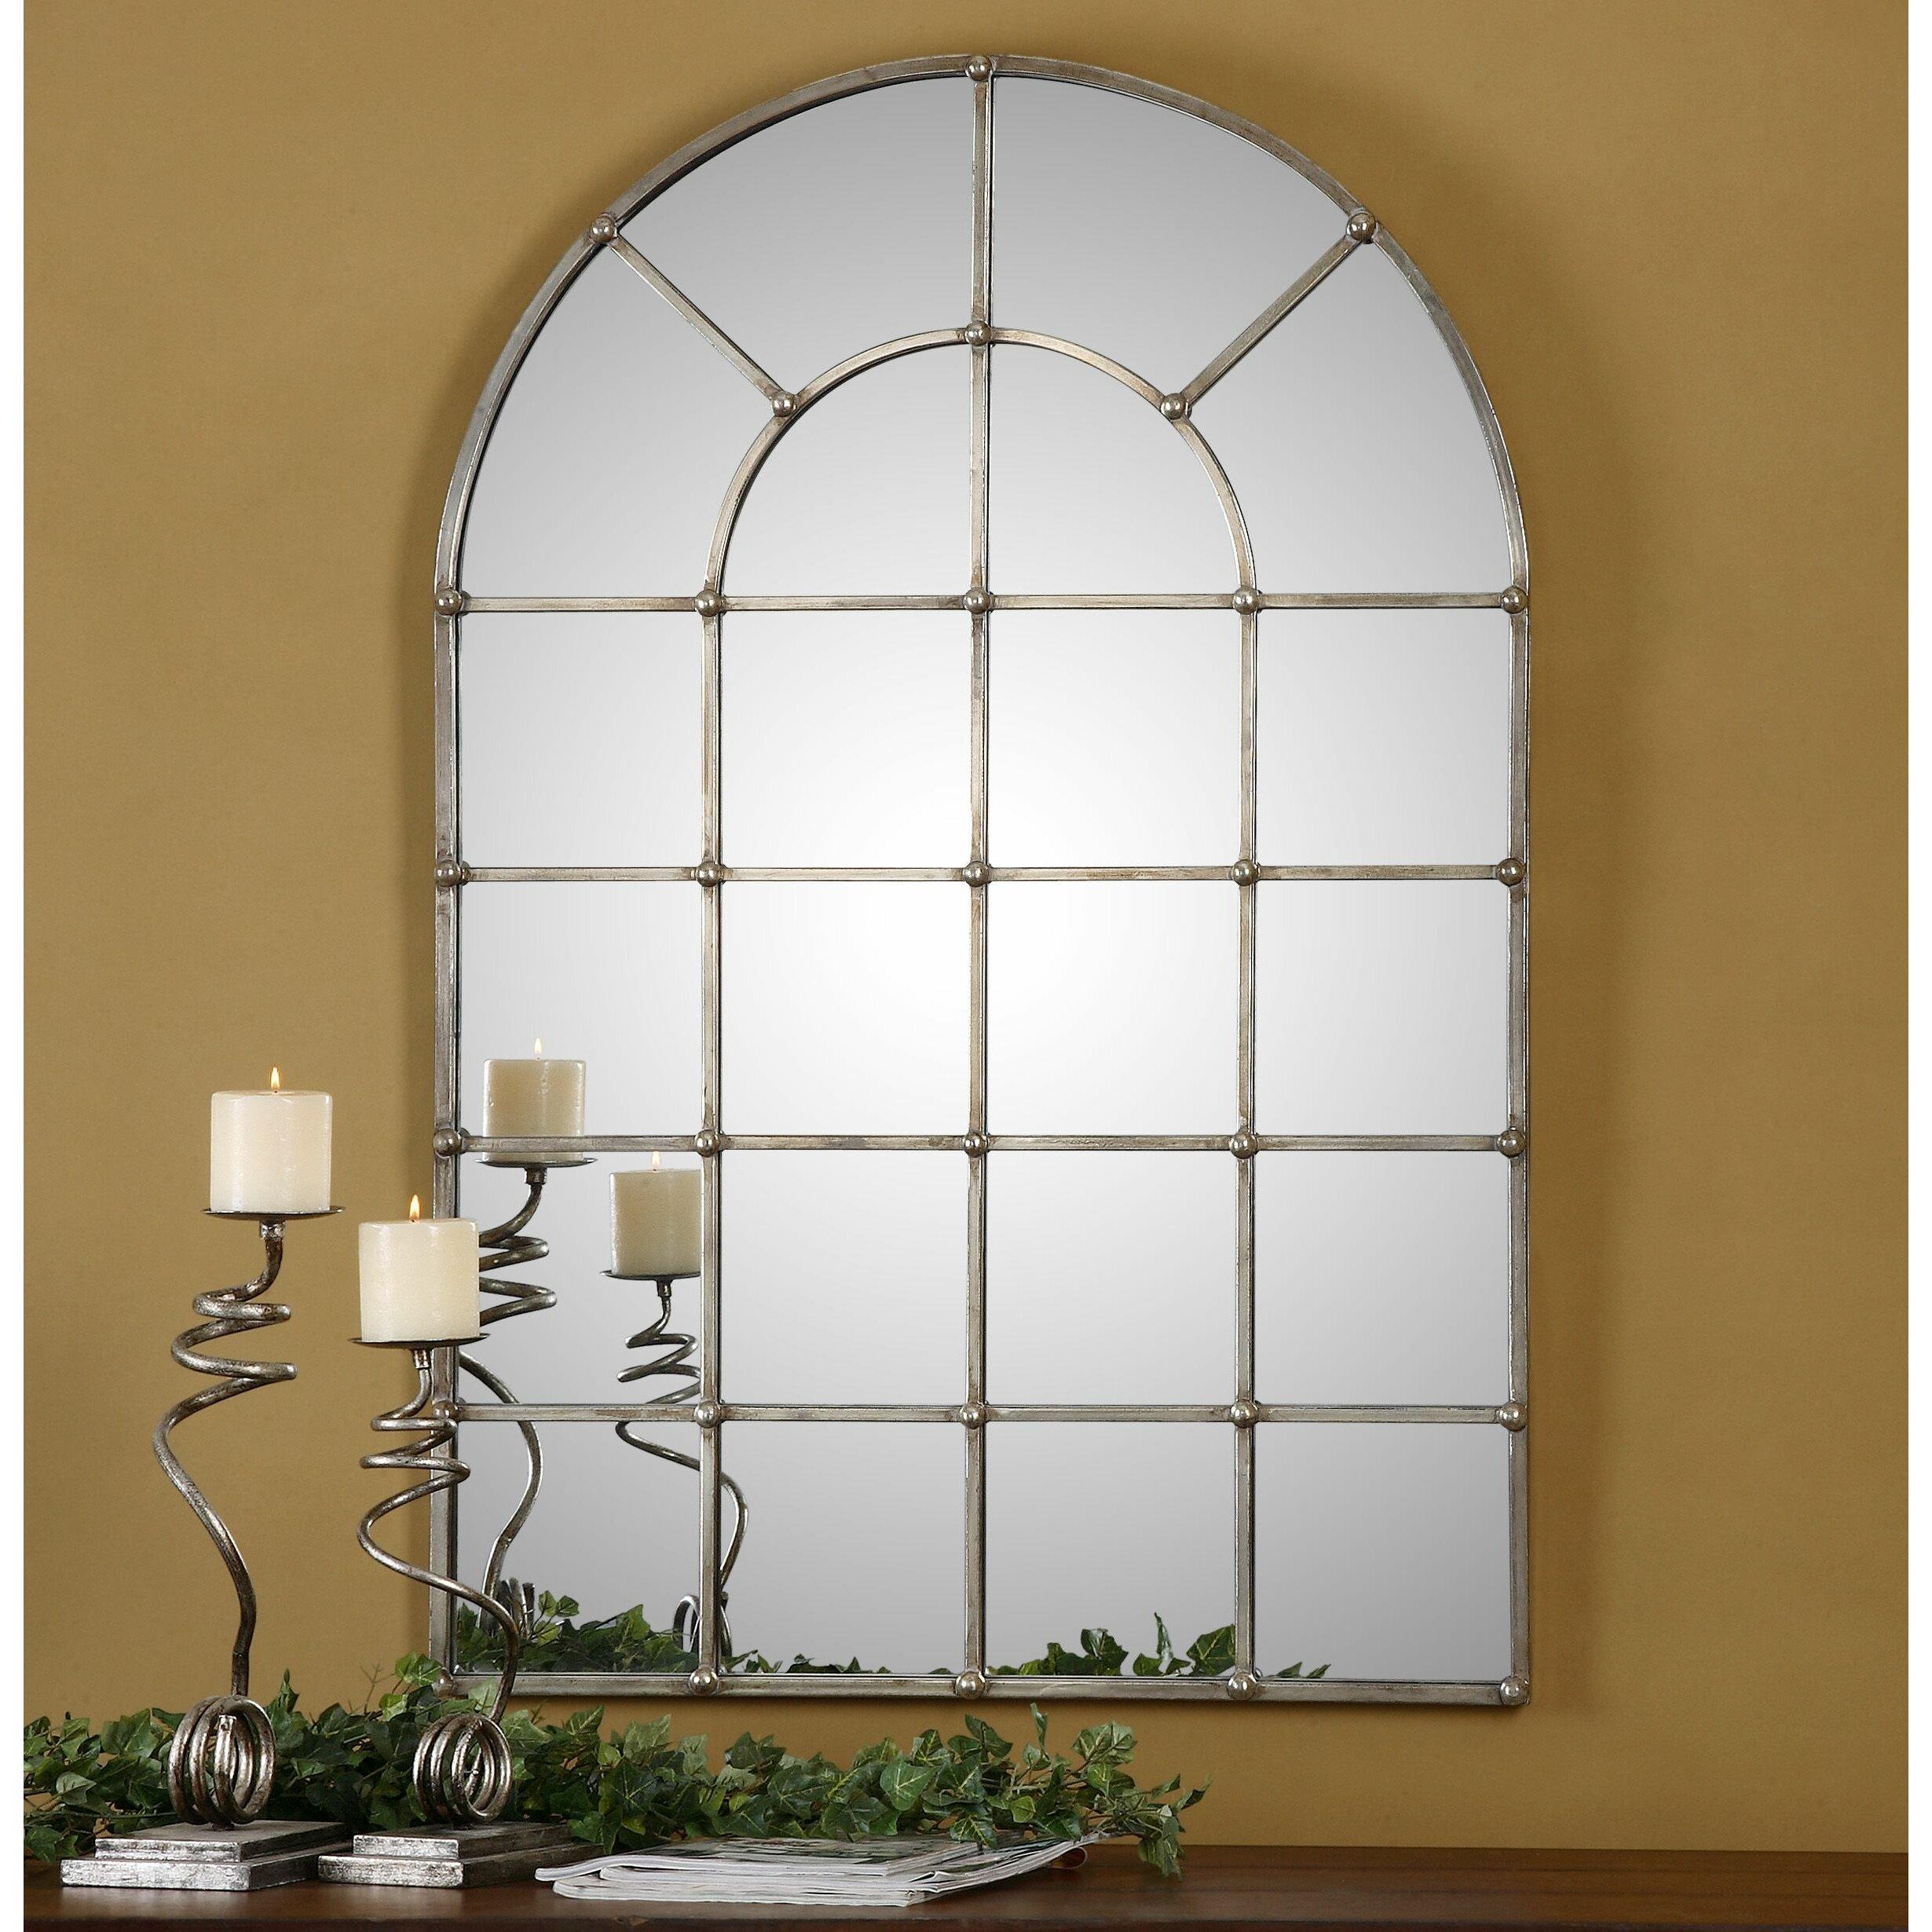 Uttermost Barwell Arch Window Wall Mirror Amp Reviews Wayfair